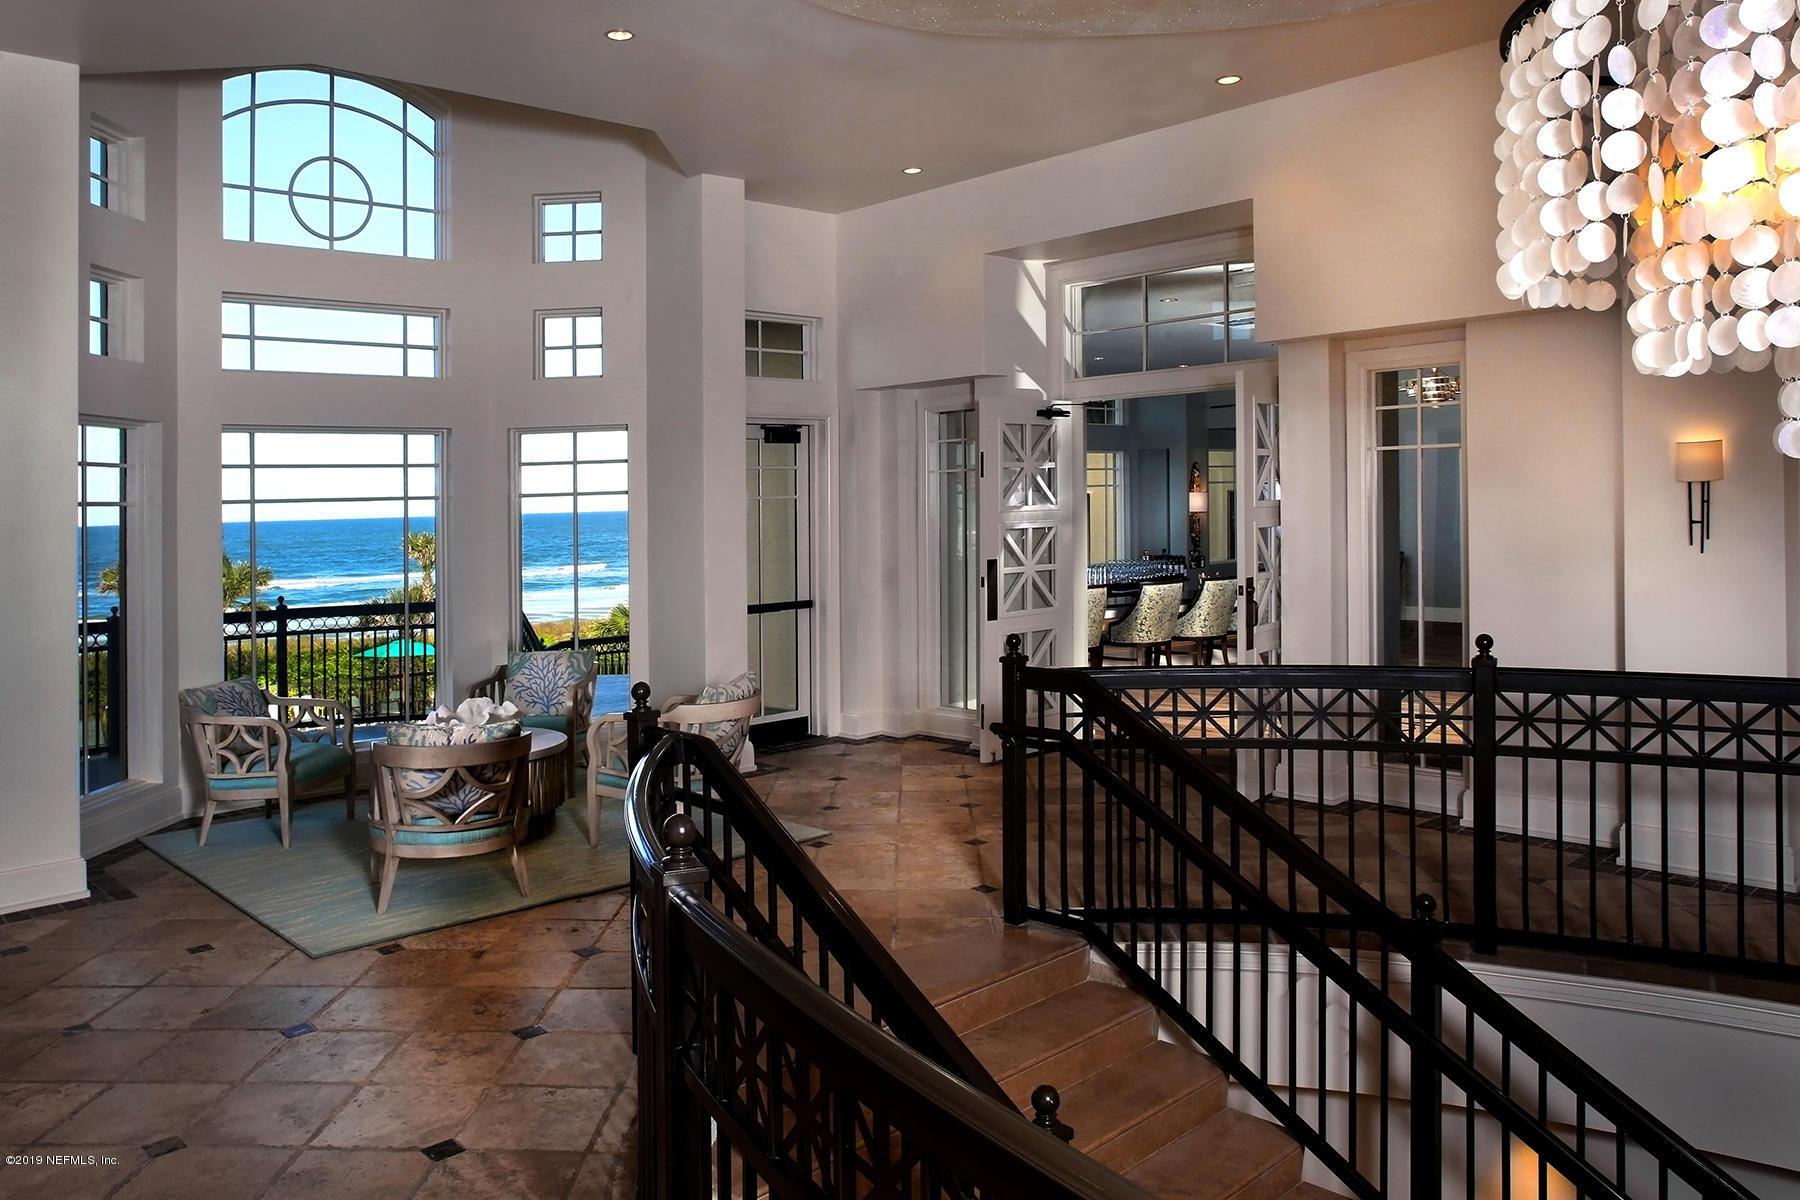 649 SUMMER, PONTE VEDRA BEACH, FLORIDA 32082, 1 Bedroom Bedrooms, ,1 BathroomBathrooms,Condo,For sale,SUMMER,995151